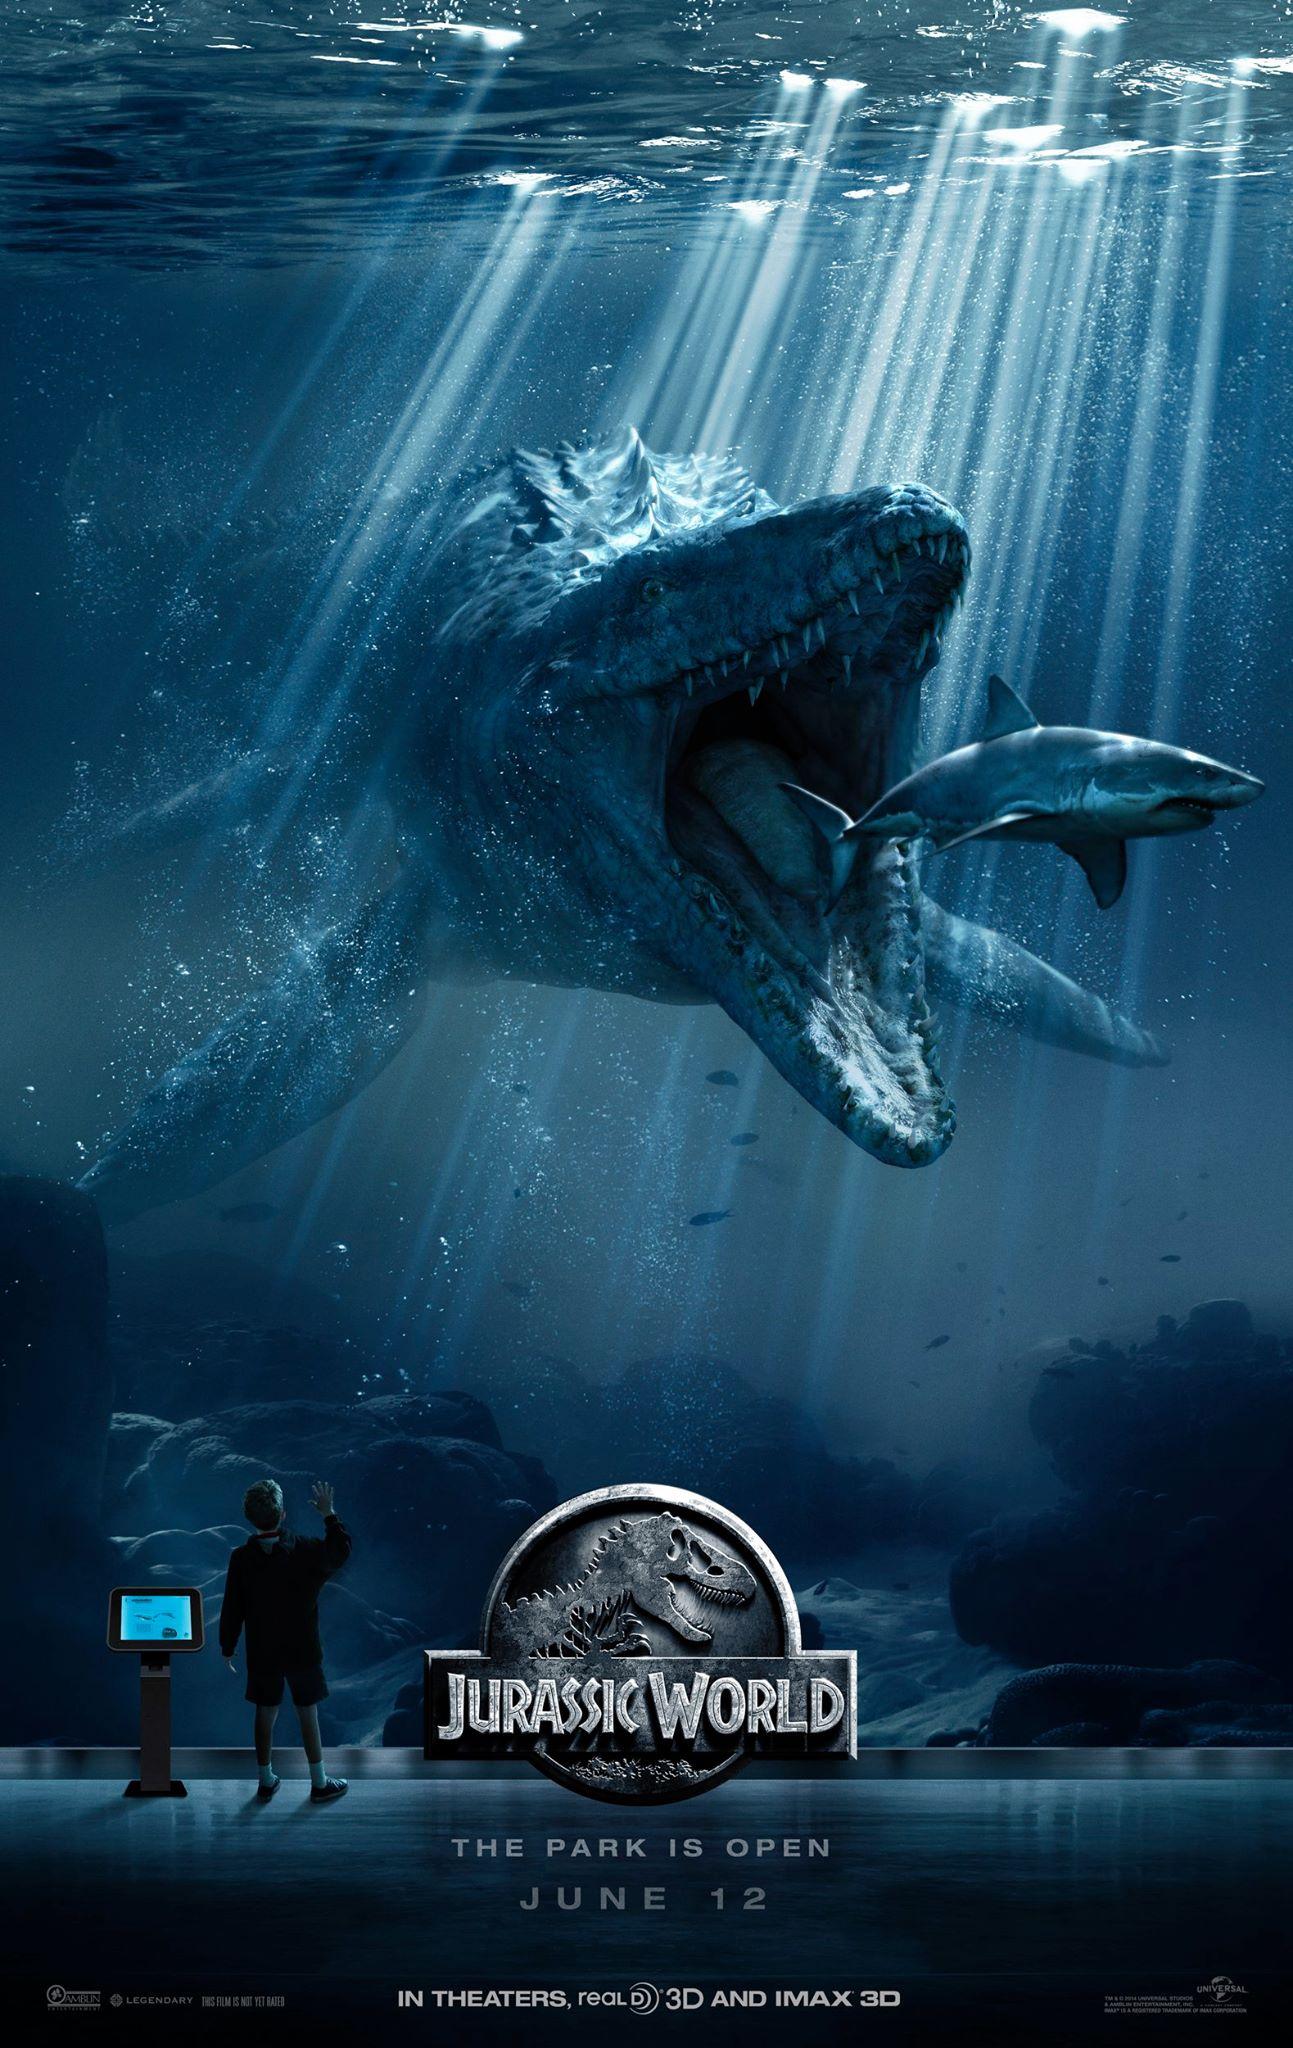 Hasil gambar untuk jurassic world poster